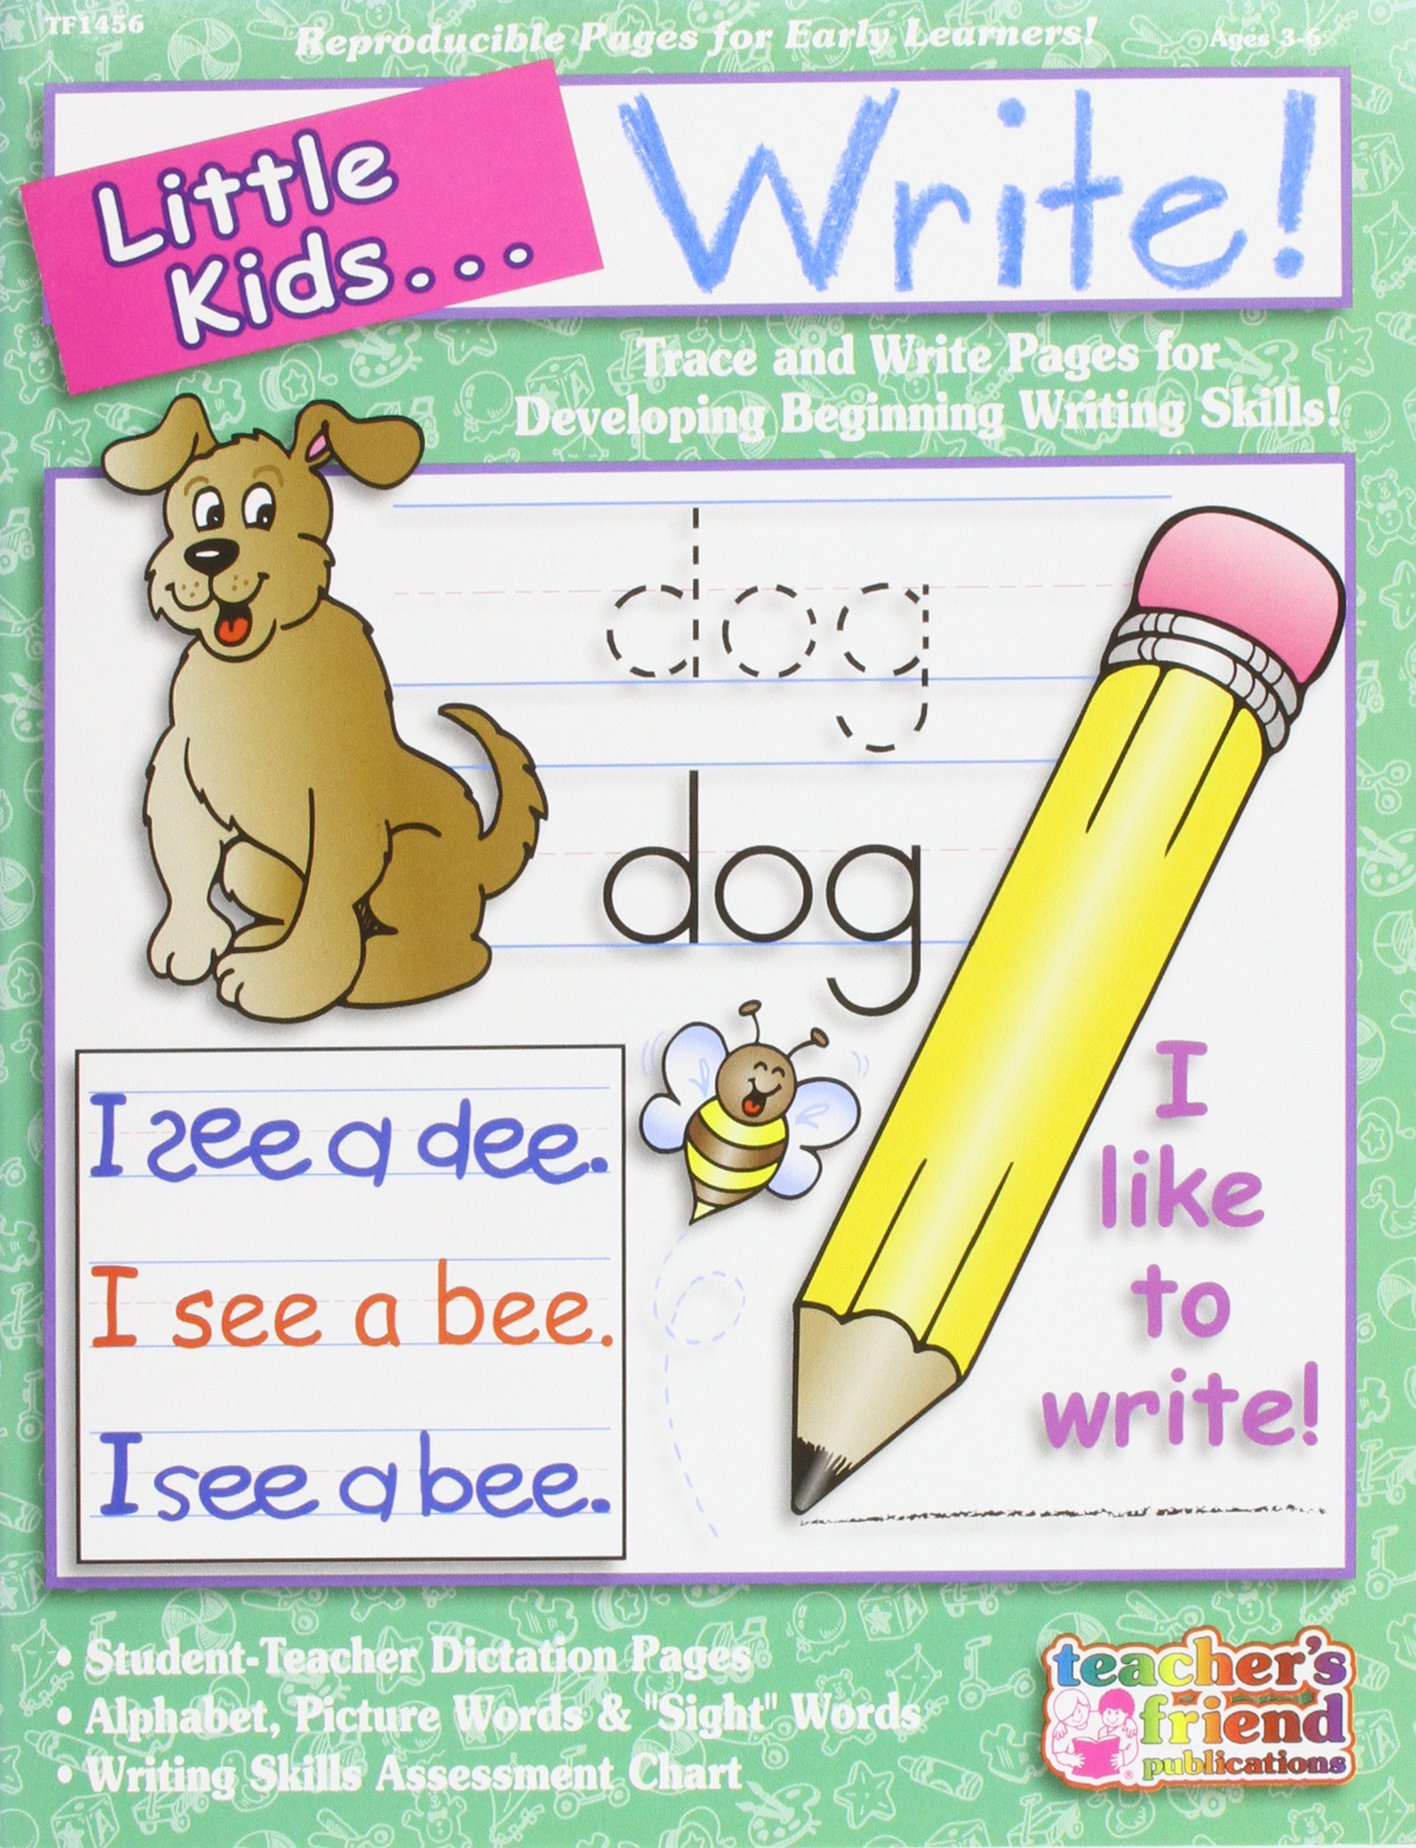 Little Kids . . . Write! PDF